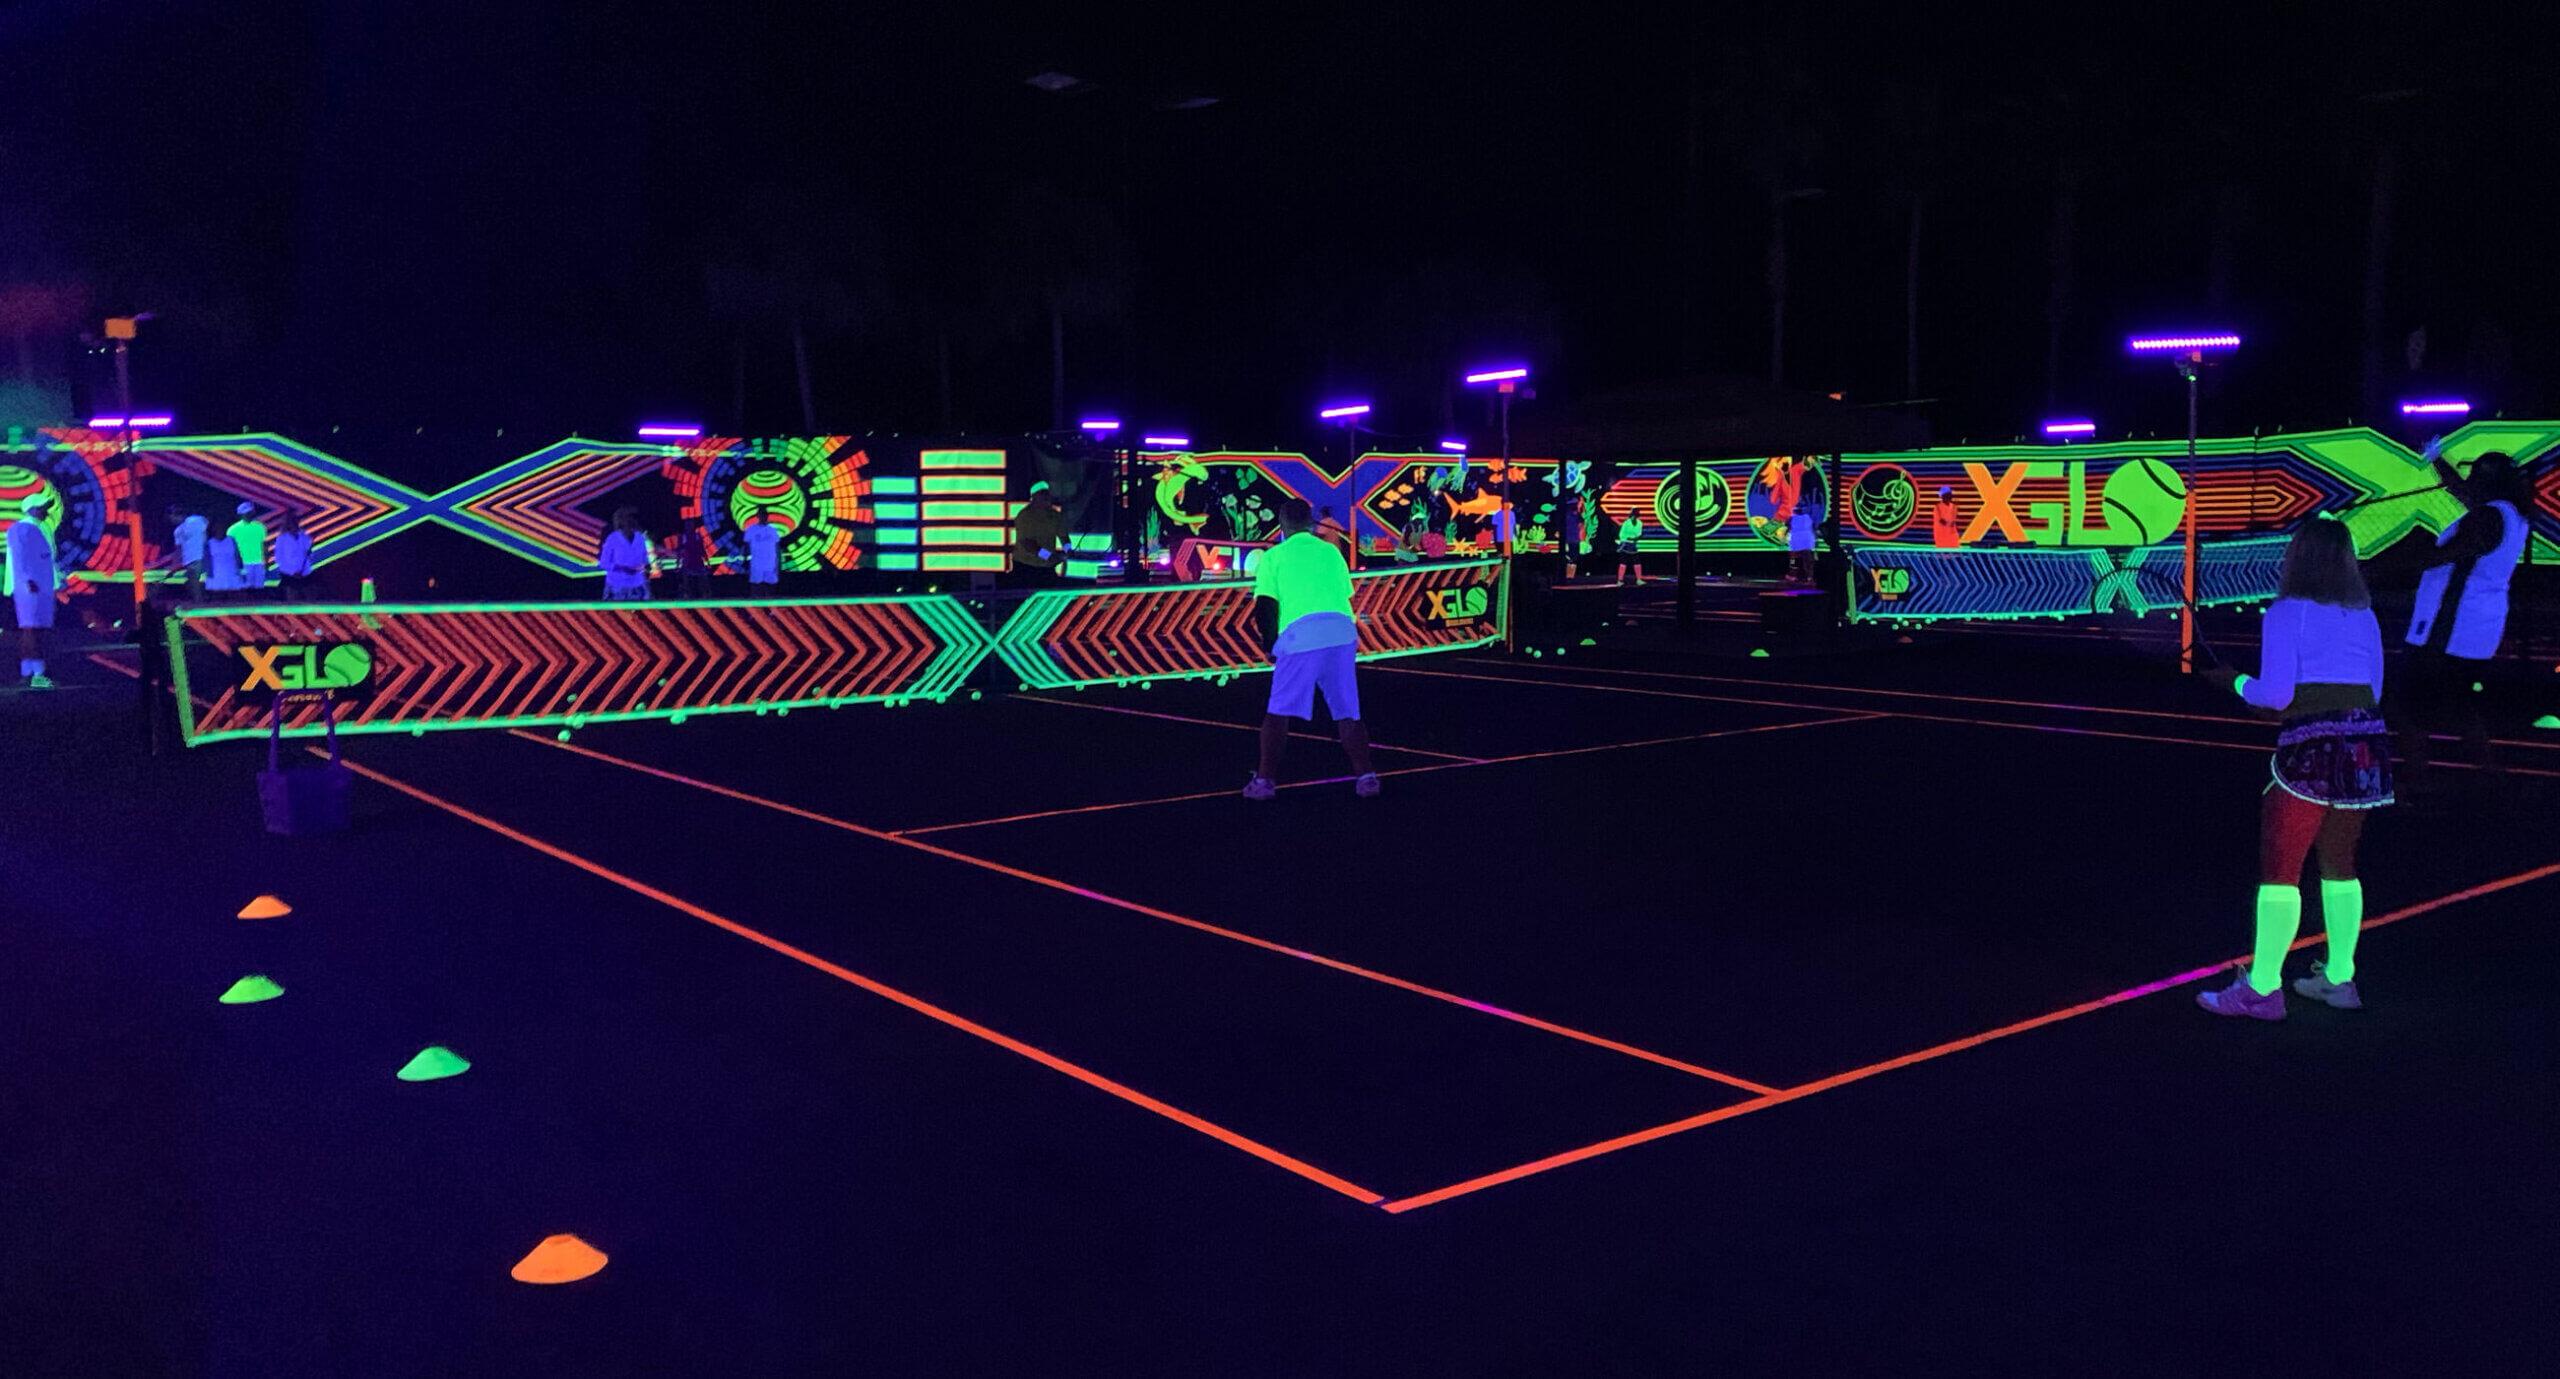 Xglo Tennis